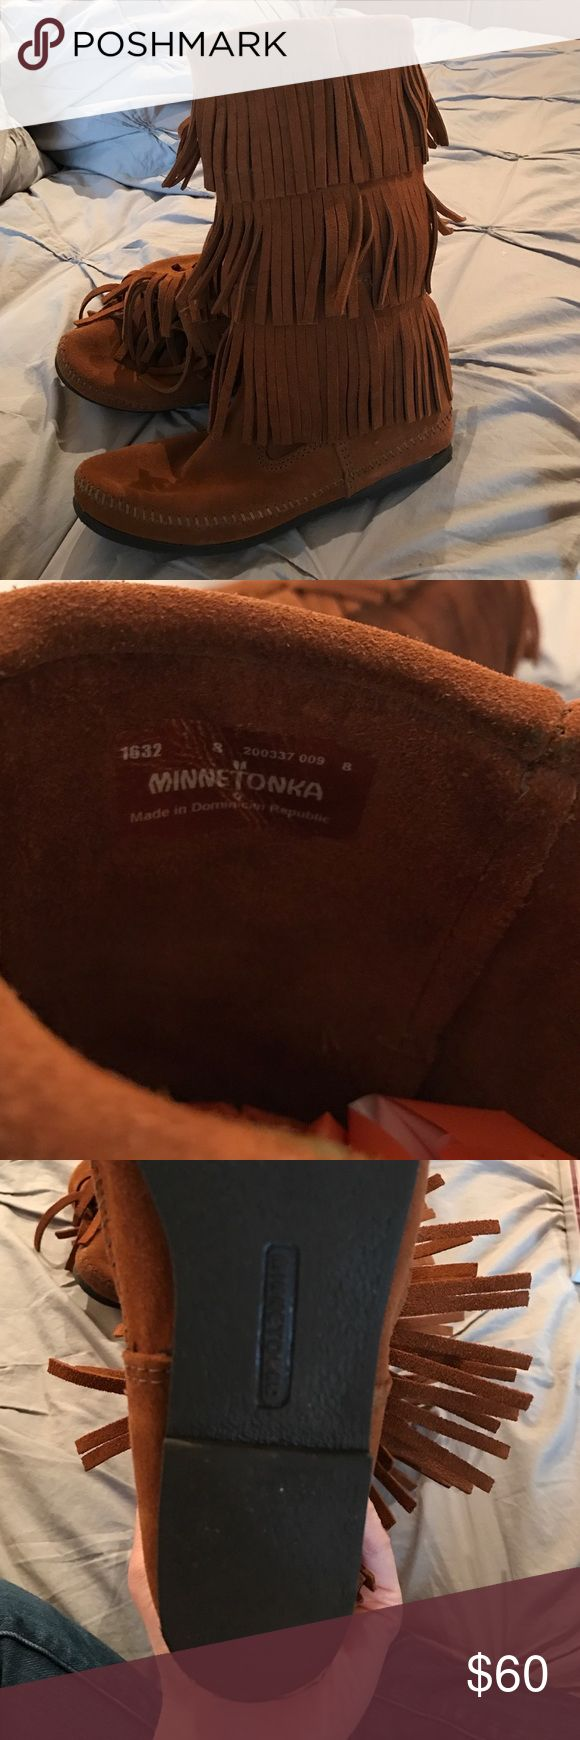 Selling this Minnetonka Boots on Poshmark! My username is: wenglund. #shopmycloset #poshmark #fashion #shopping #style #forsale #Minnetonka #Shoes